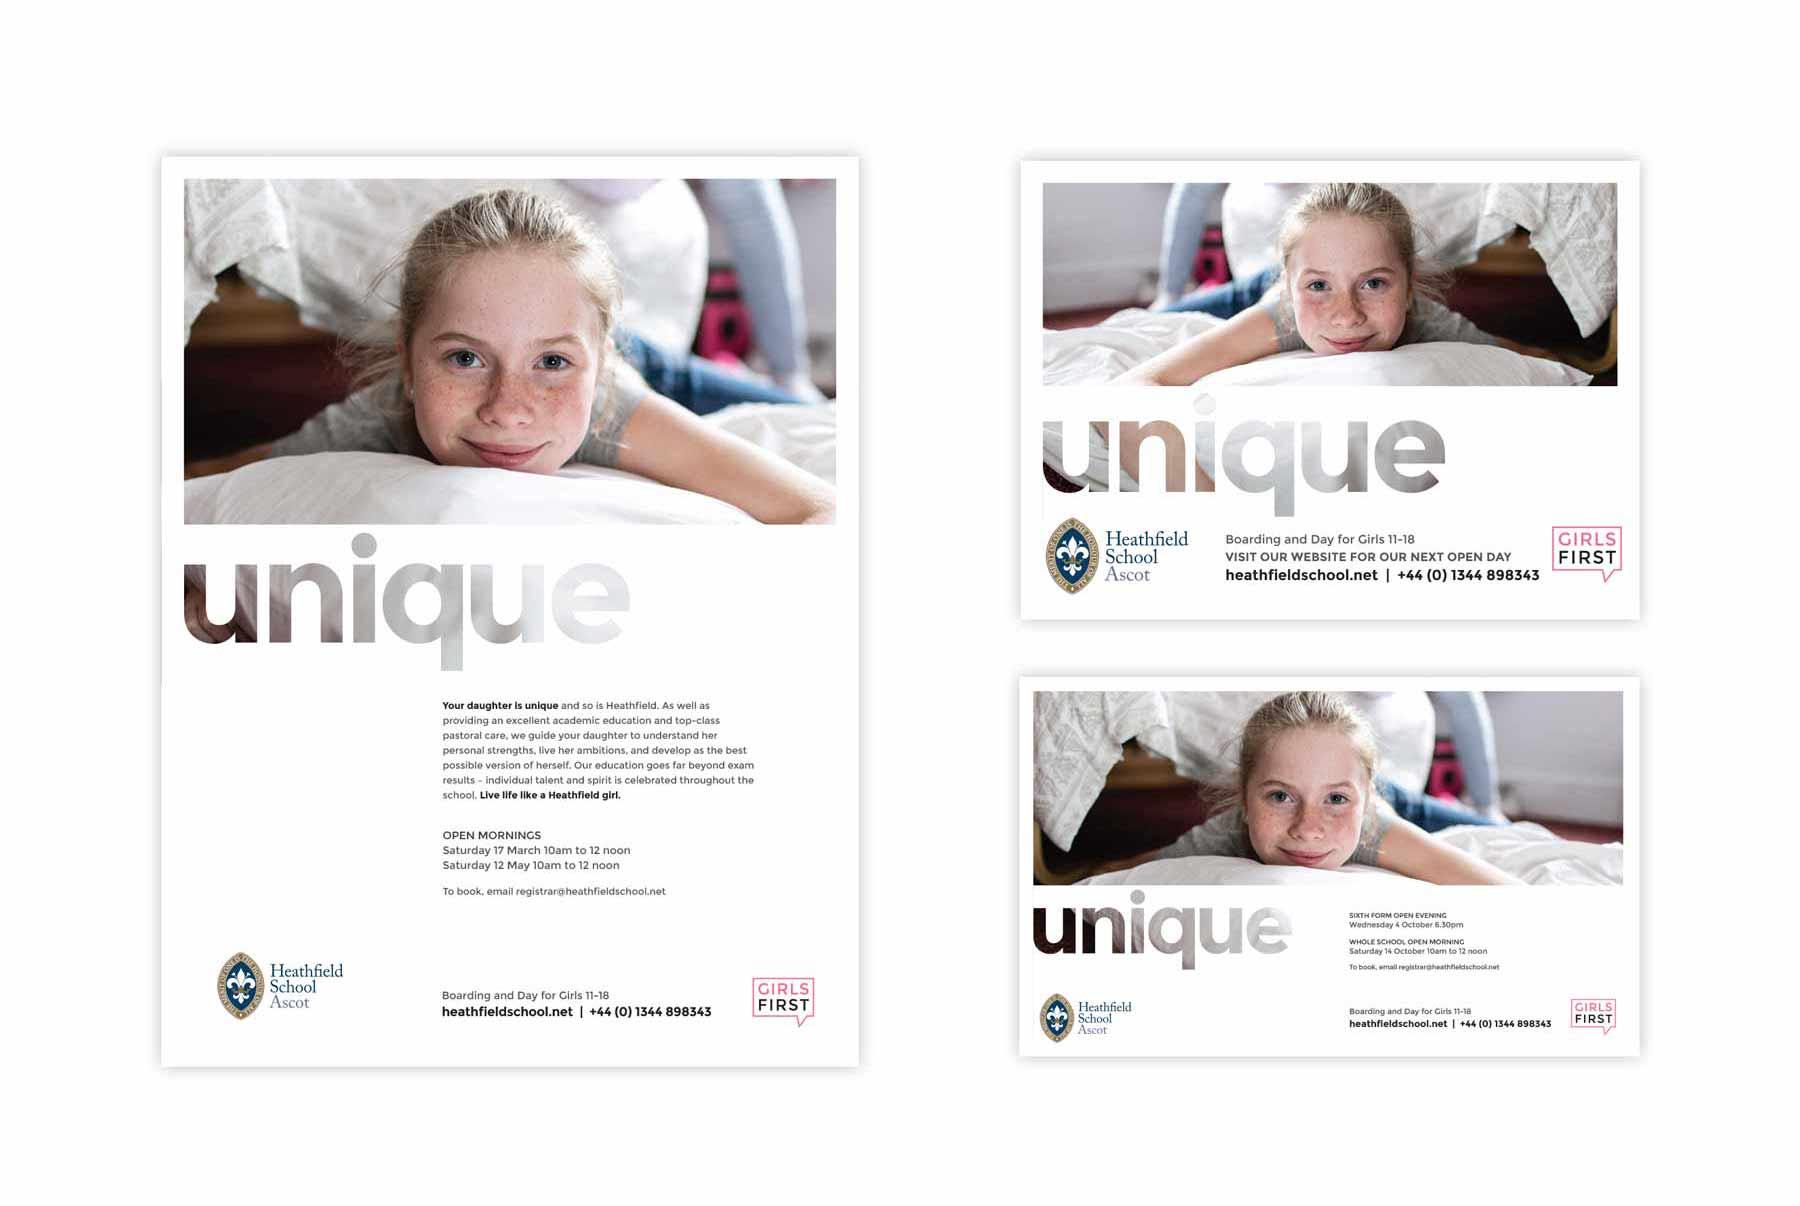 advertising campaign design flexibility